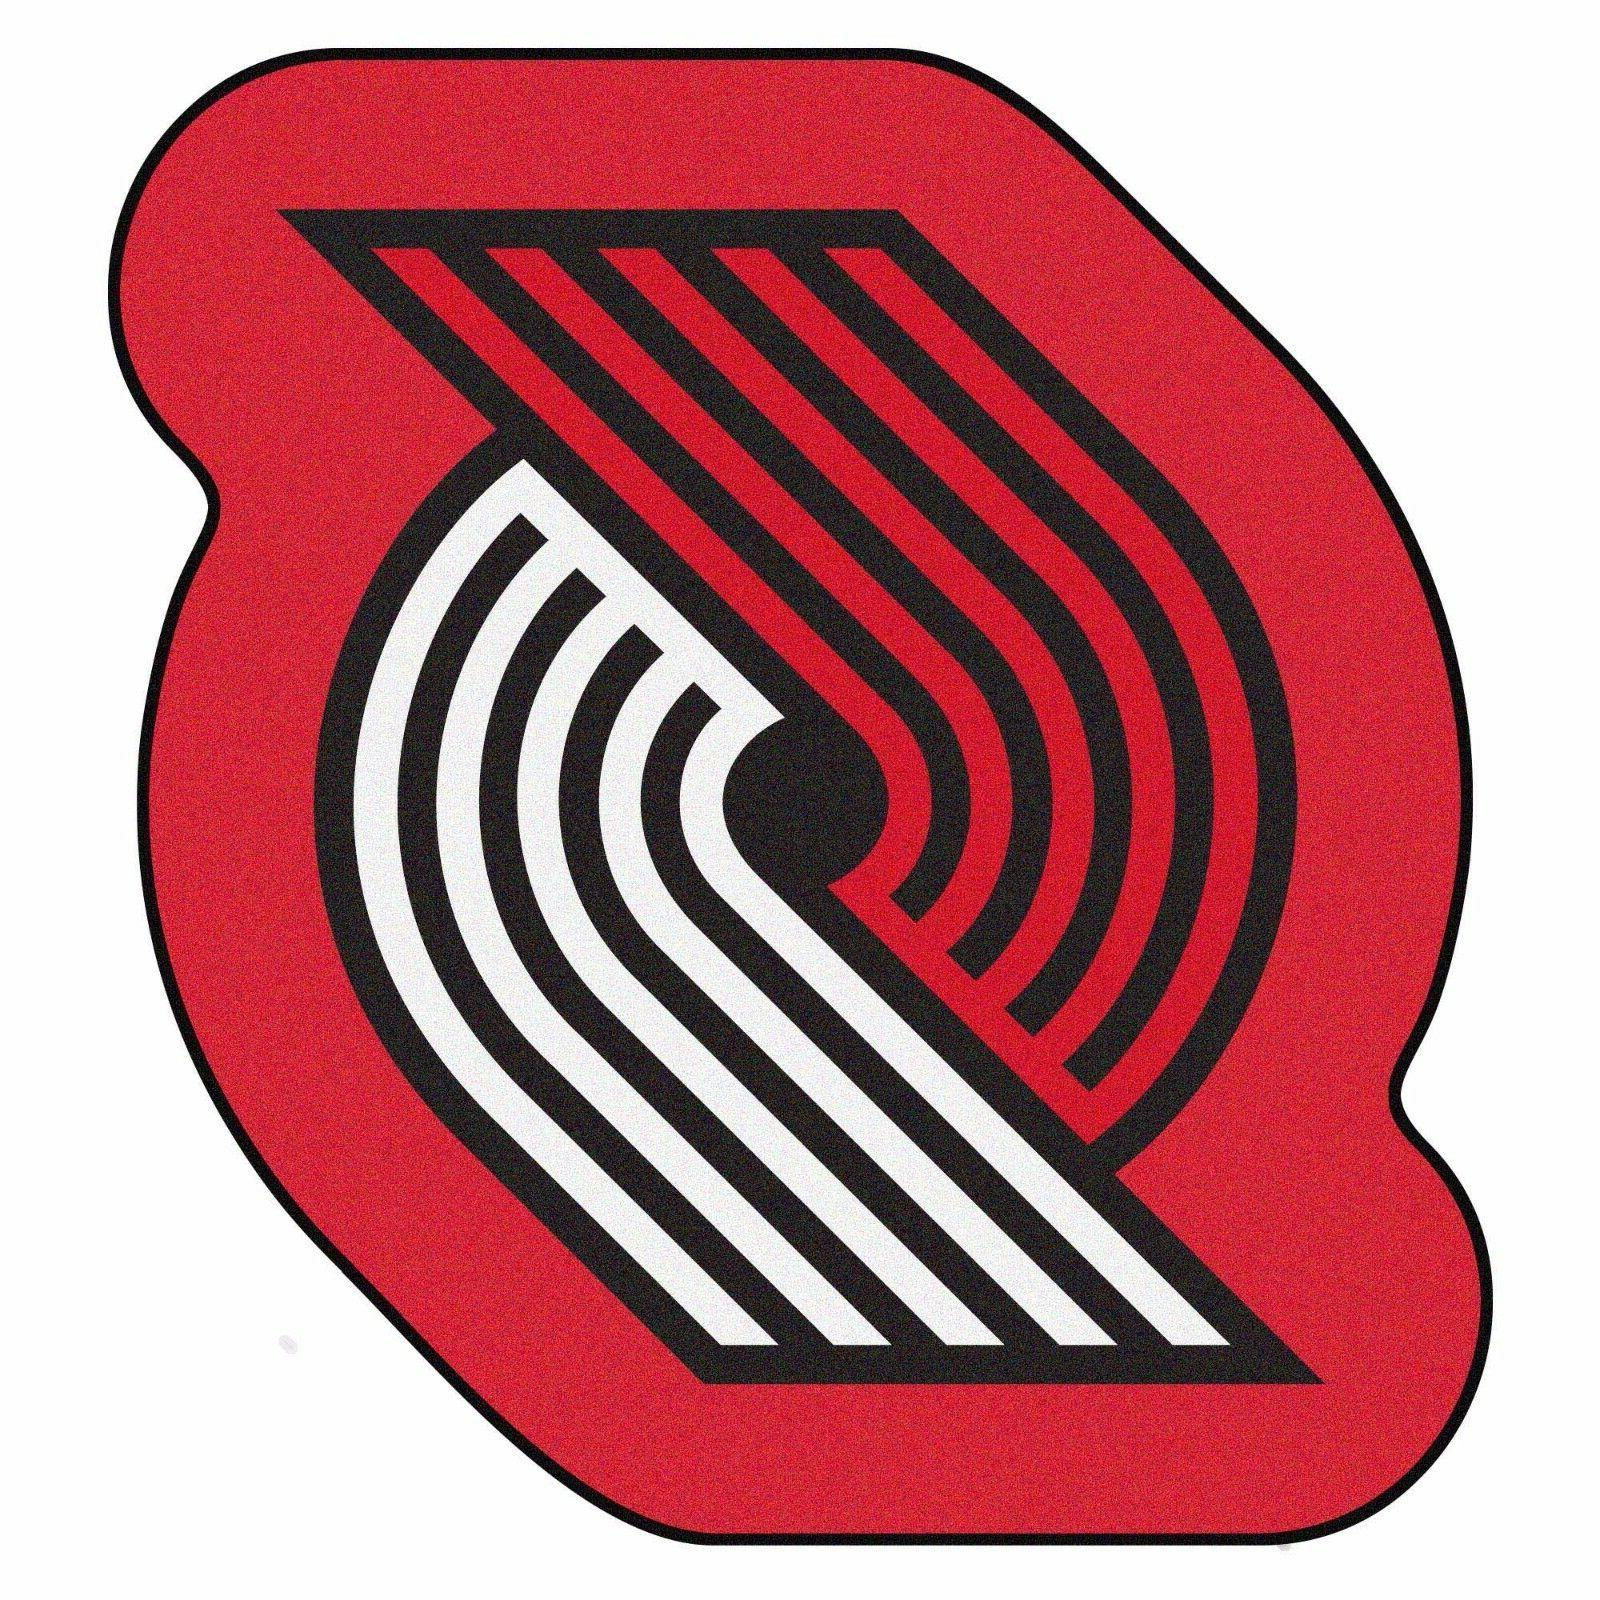 portland trail blazers mascot decorative logo cut